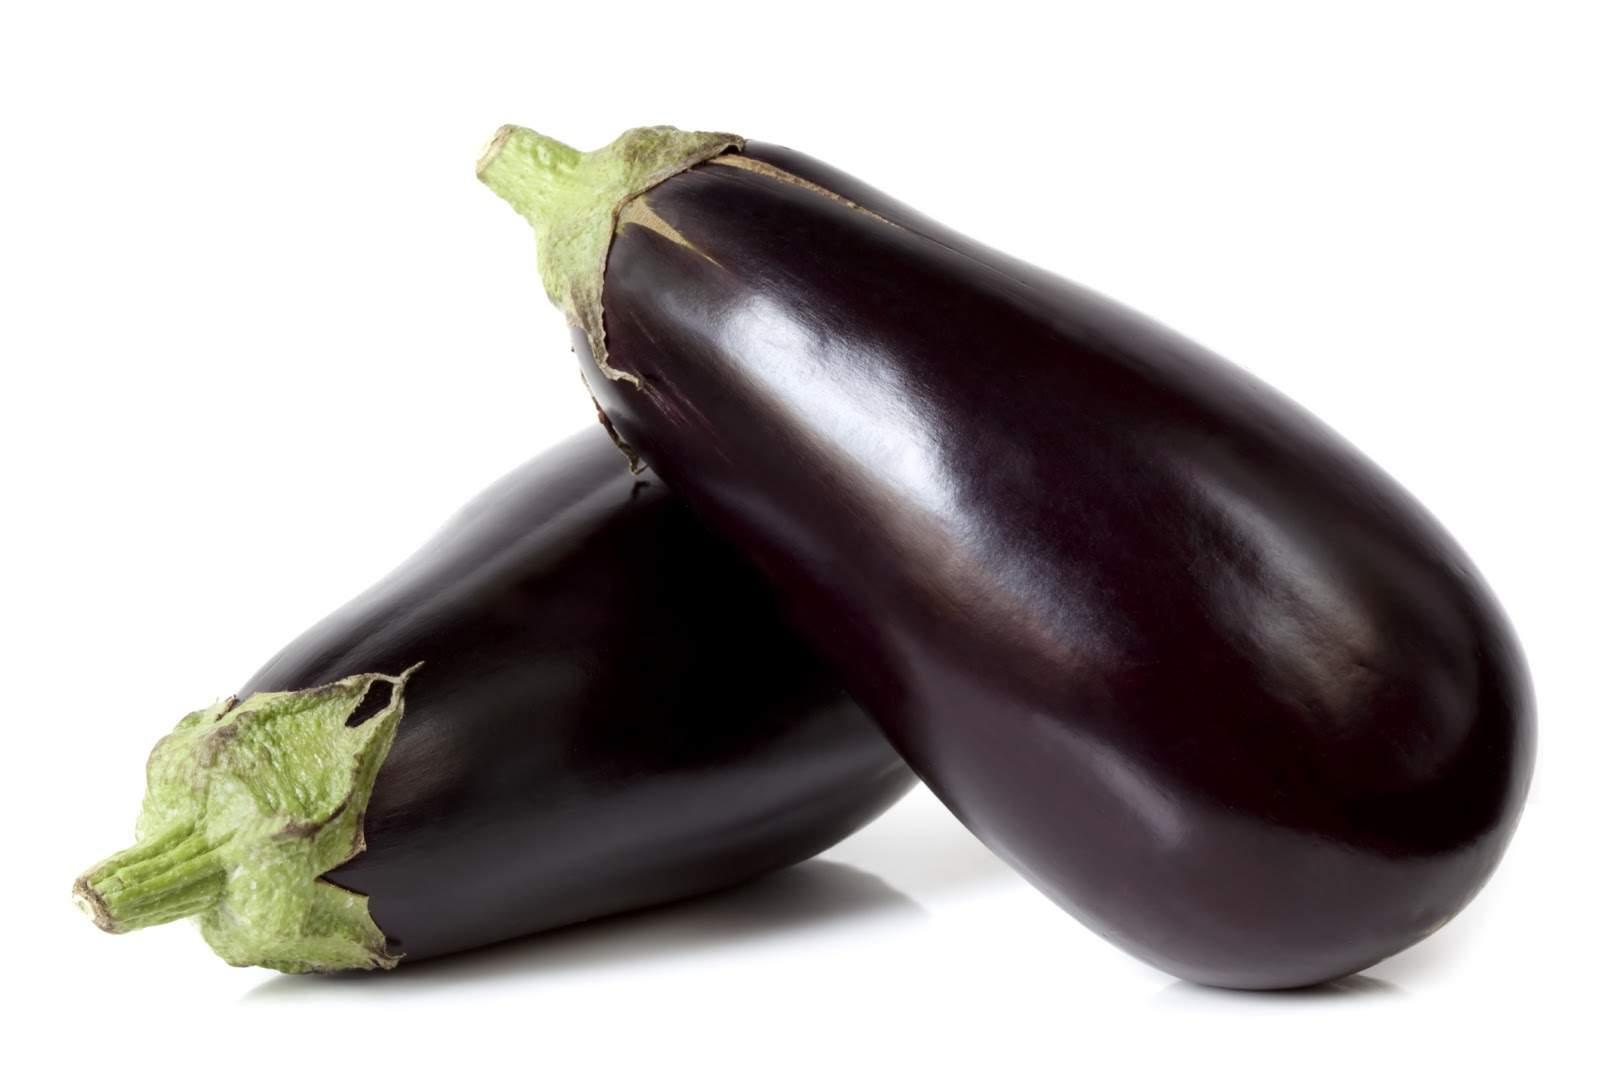 Eggplant – Black Globe LOCAL Serres de l'Outaouais (Each/Approx 1LB)